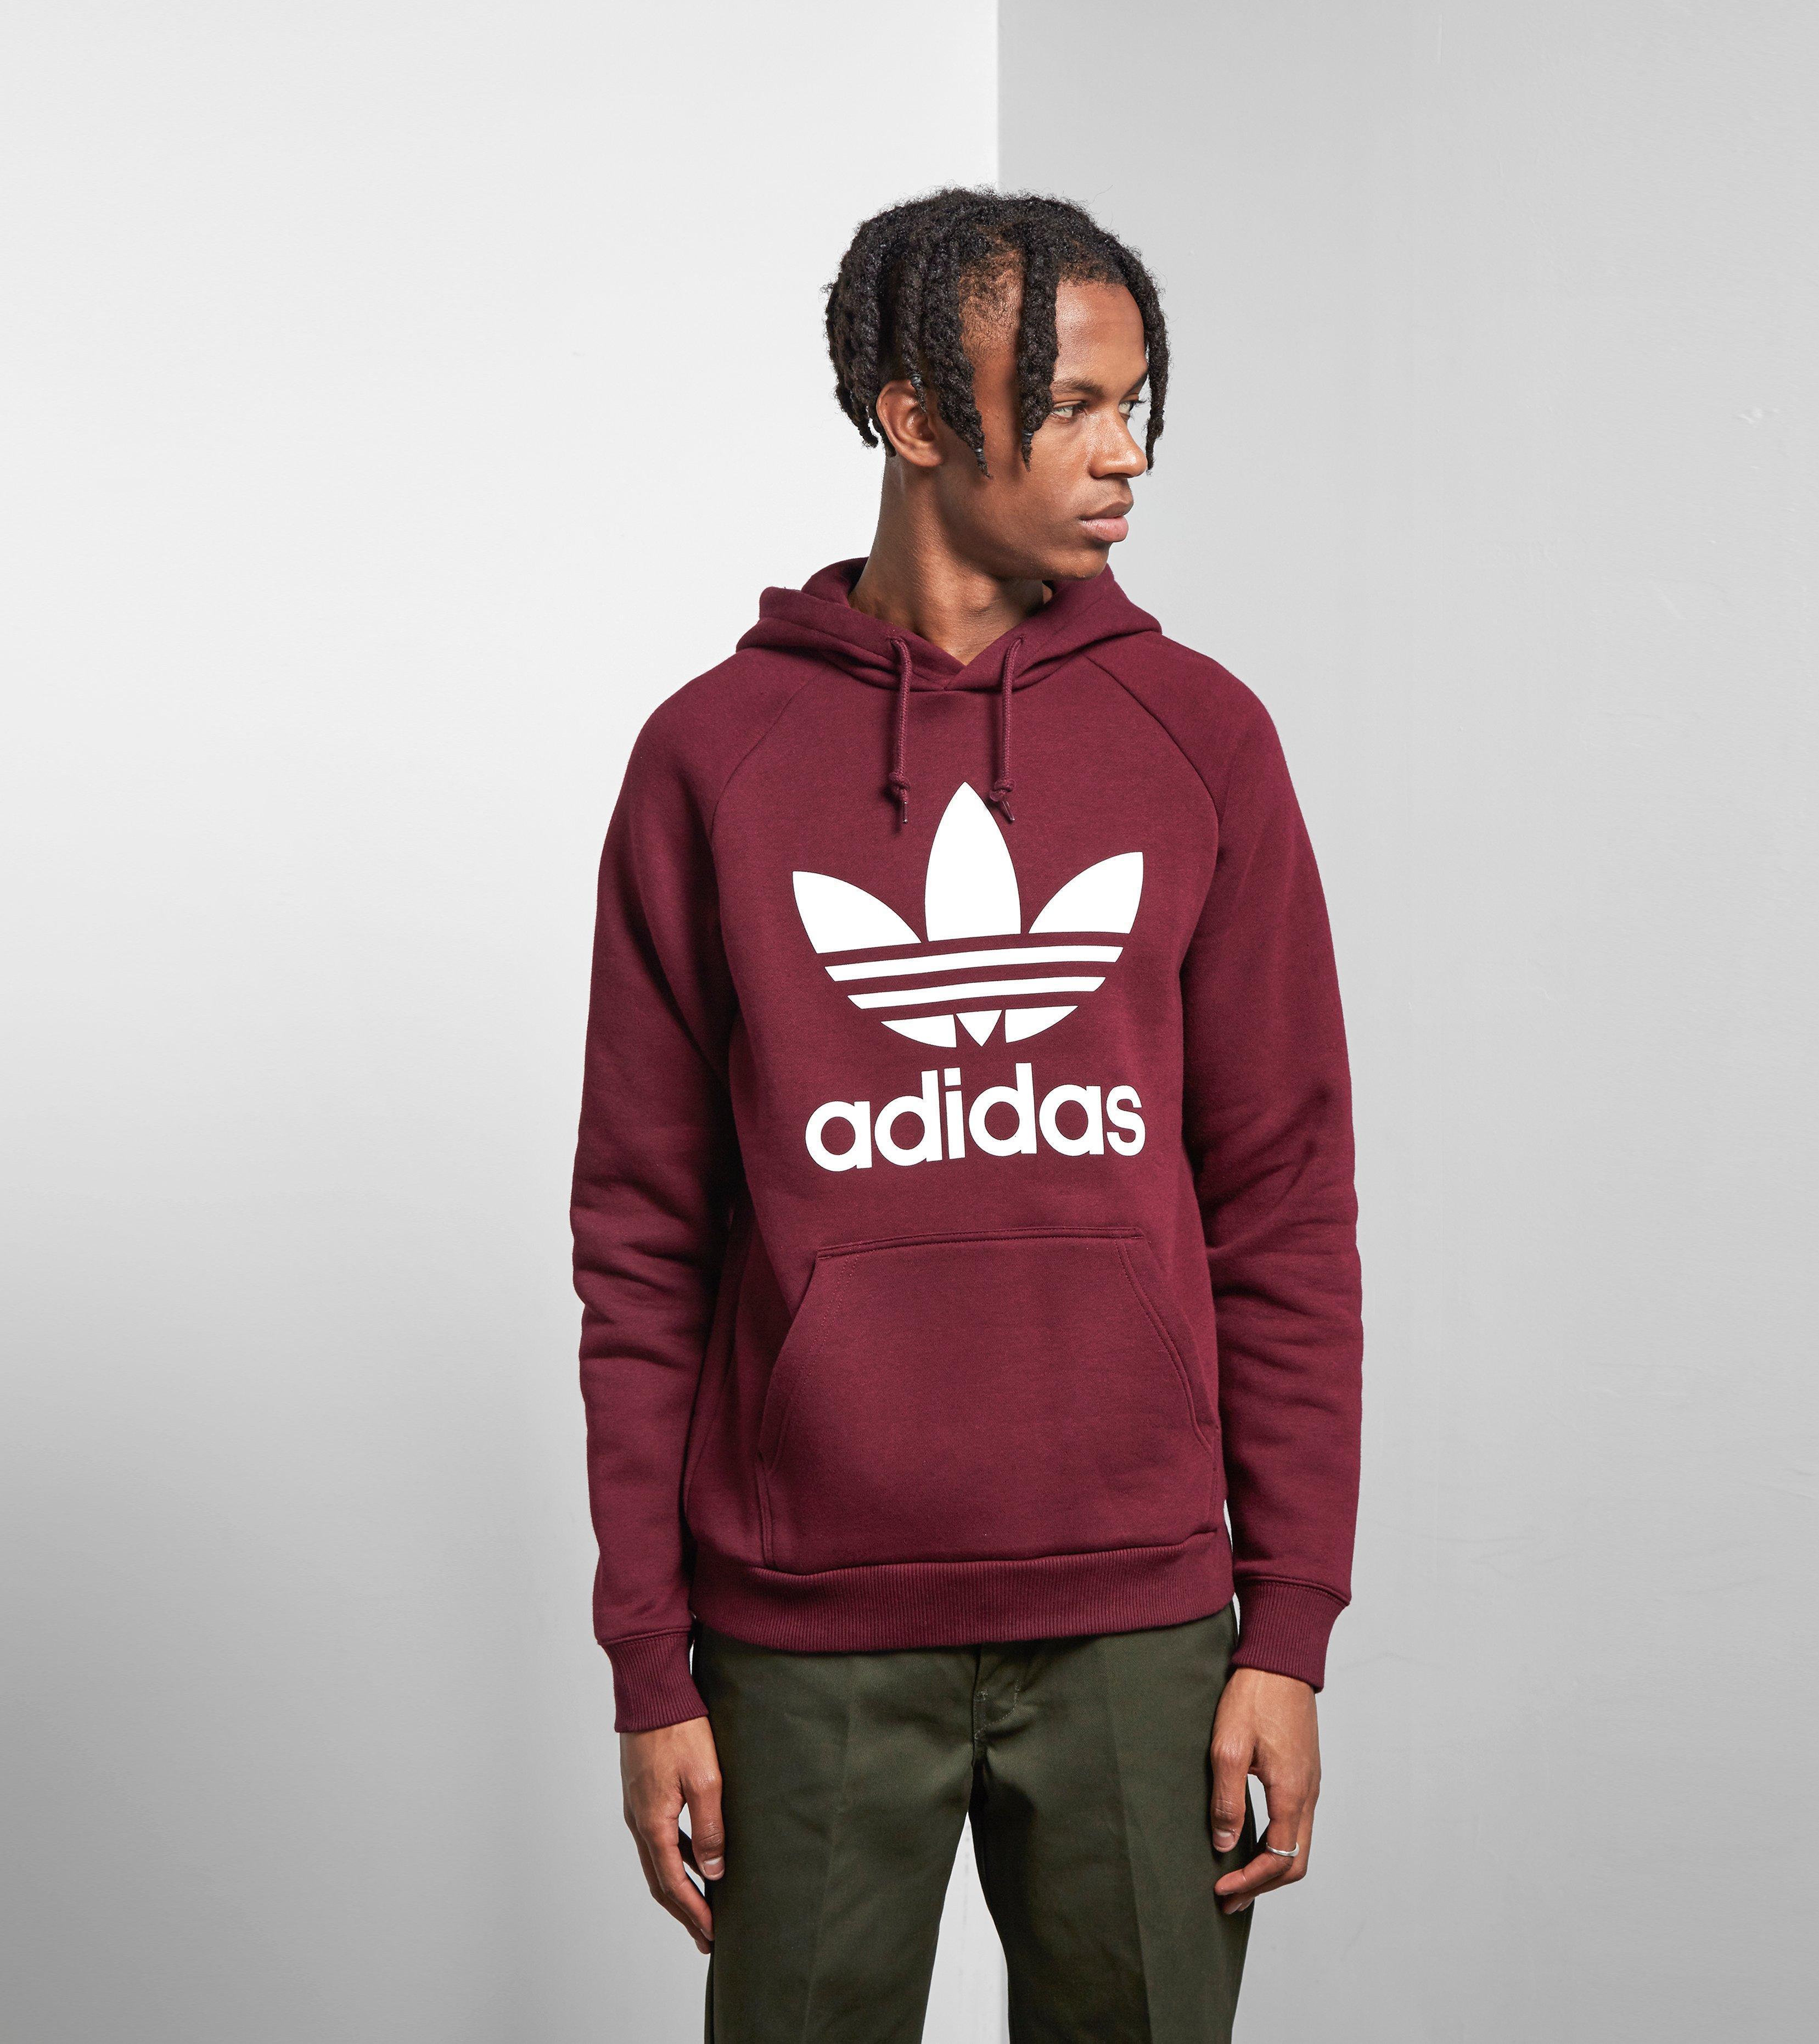 Lyst - Adidas Originals Trefoil Hoody in Red for Men b513a434f75